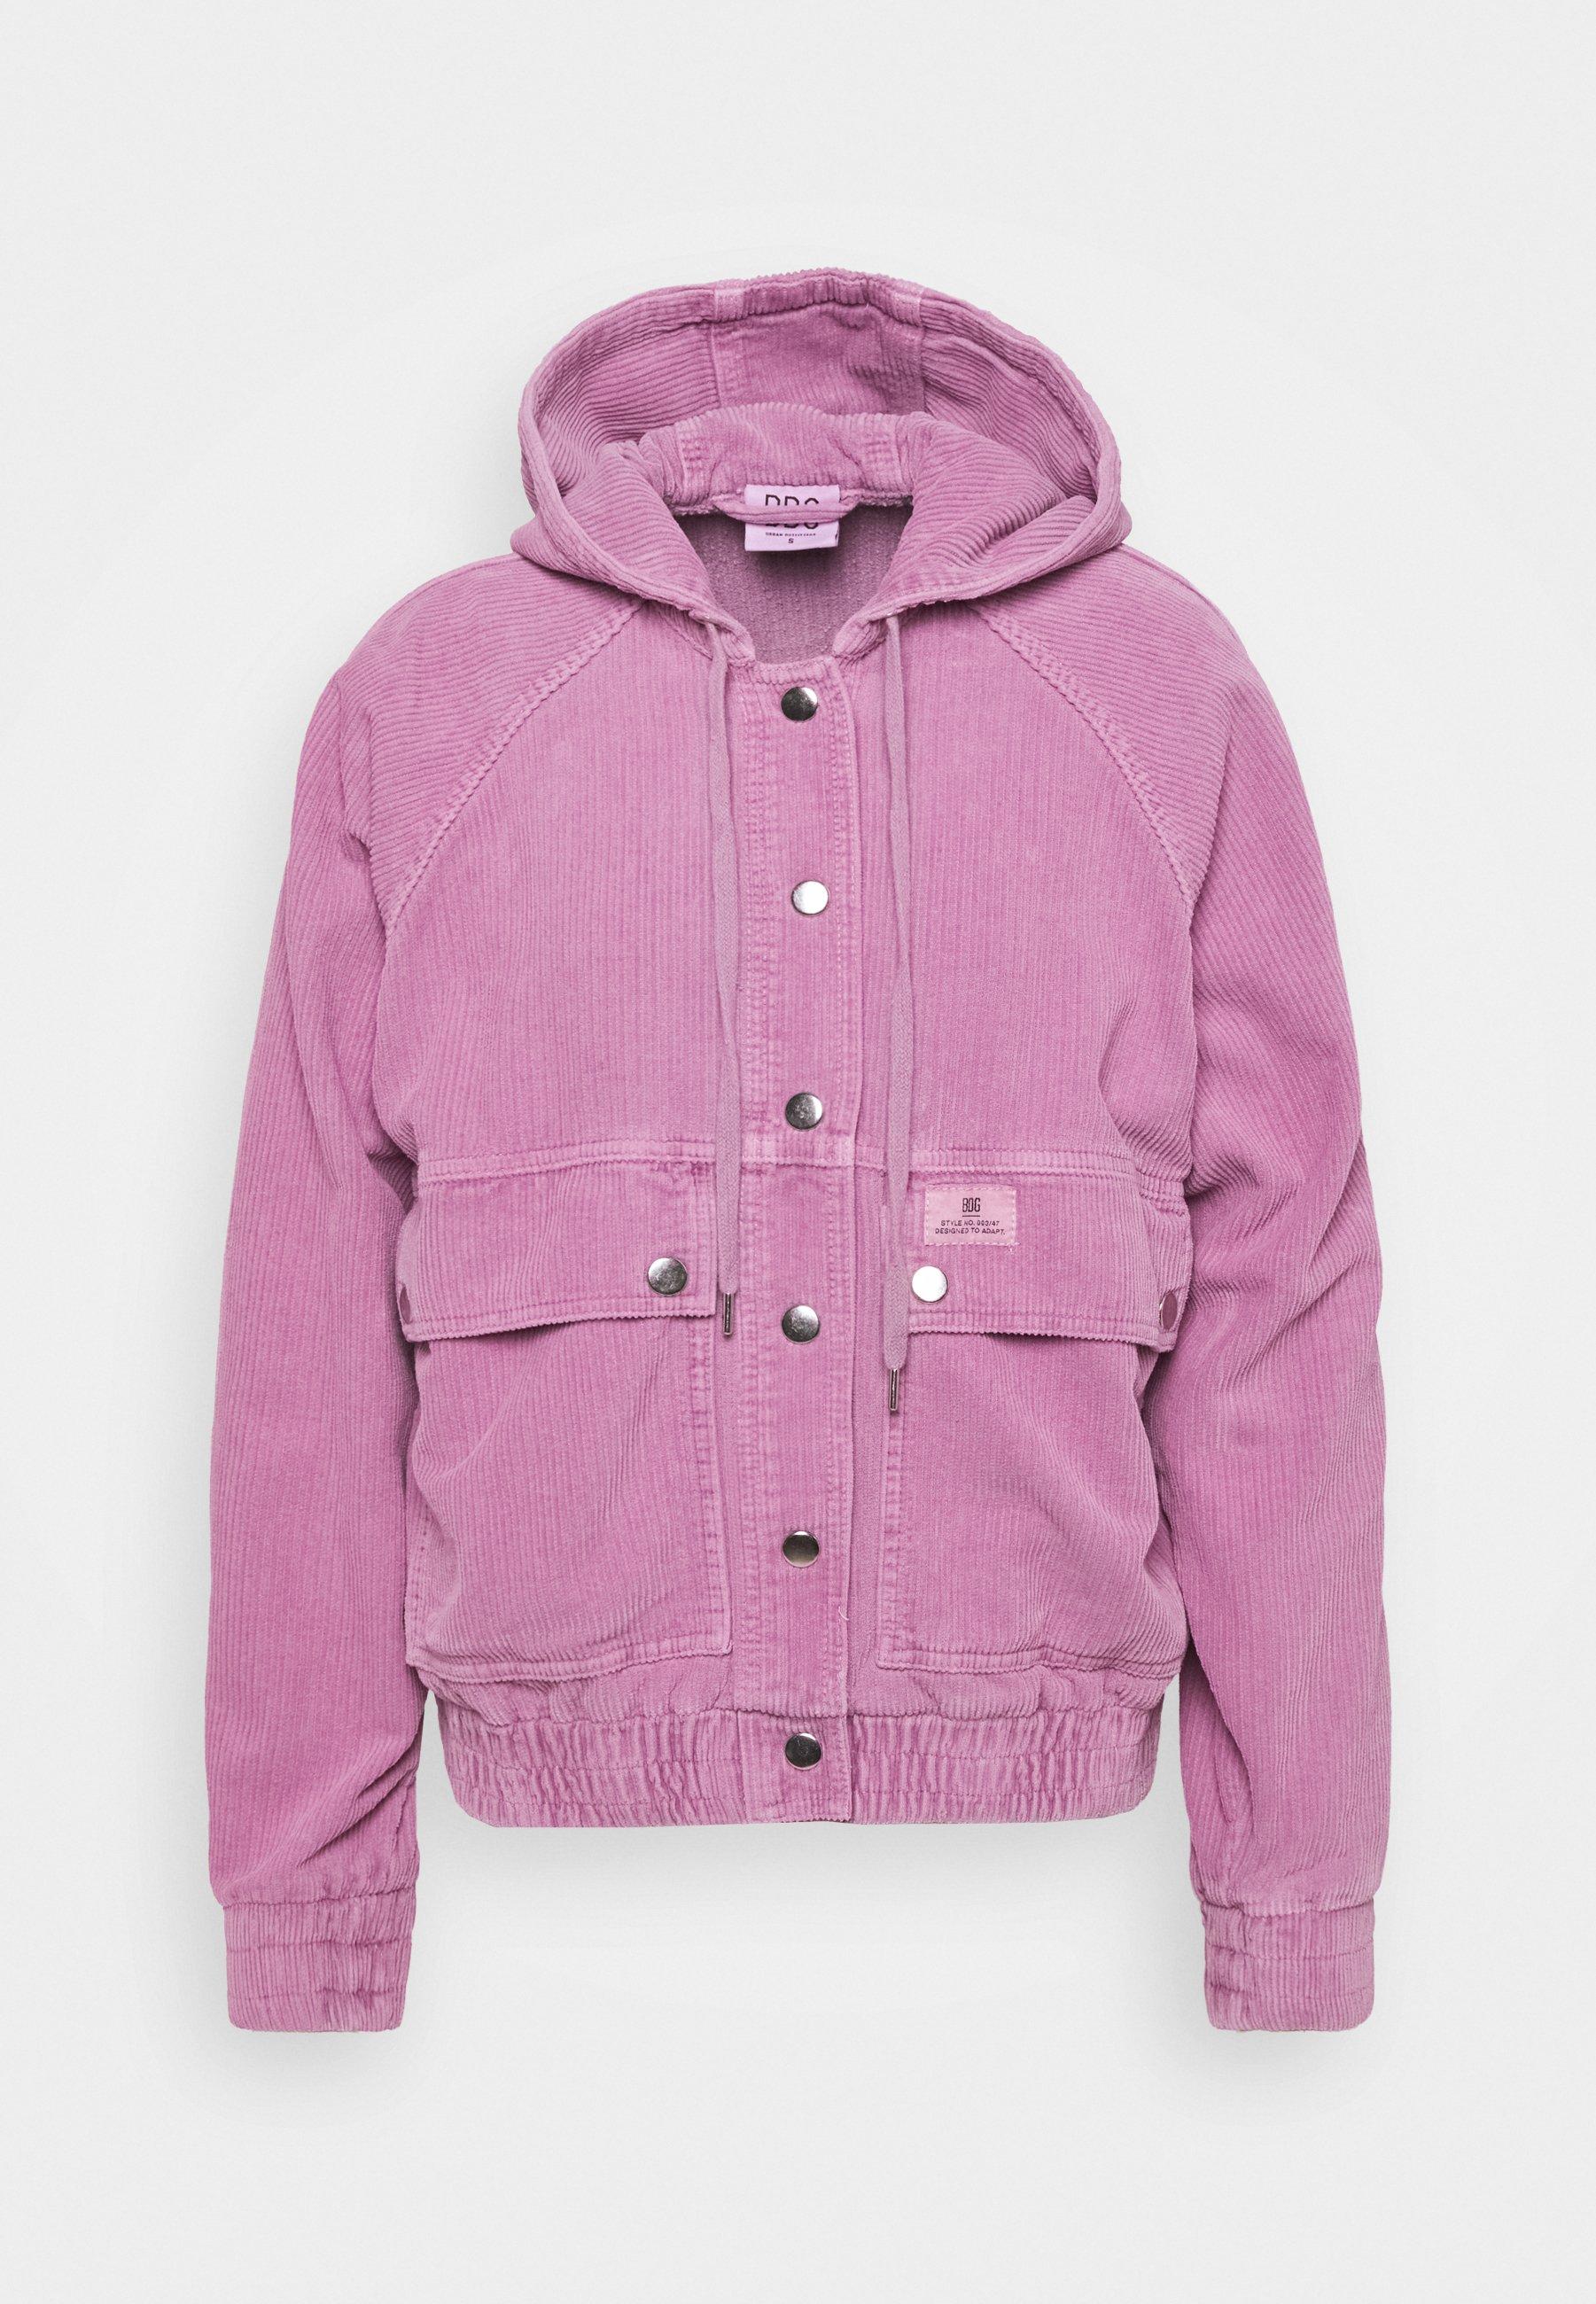 BDG Urban Outfitters HOODED JACKET - Overgangsjakker - pink -  6kk8r